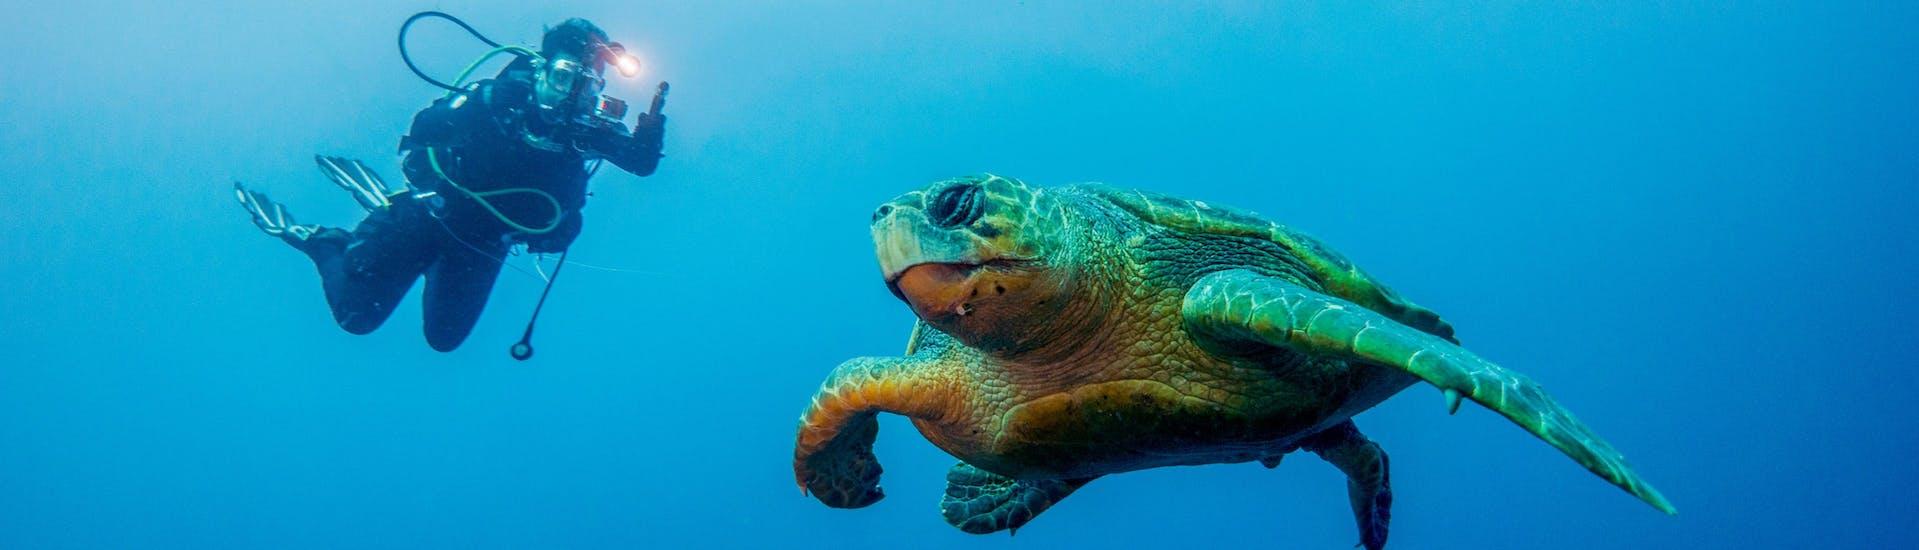 A scuba diver is taking a photograph of a turtle while scuba diving near Umkomaas.